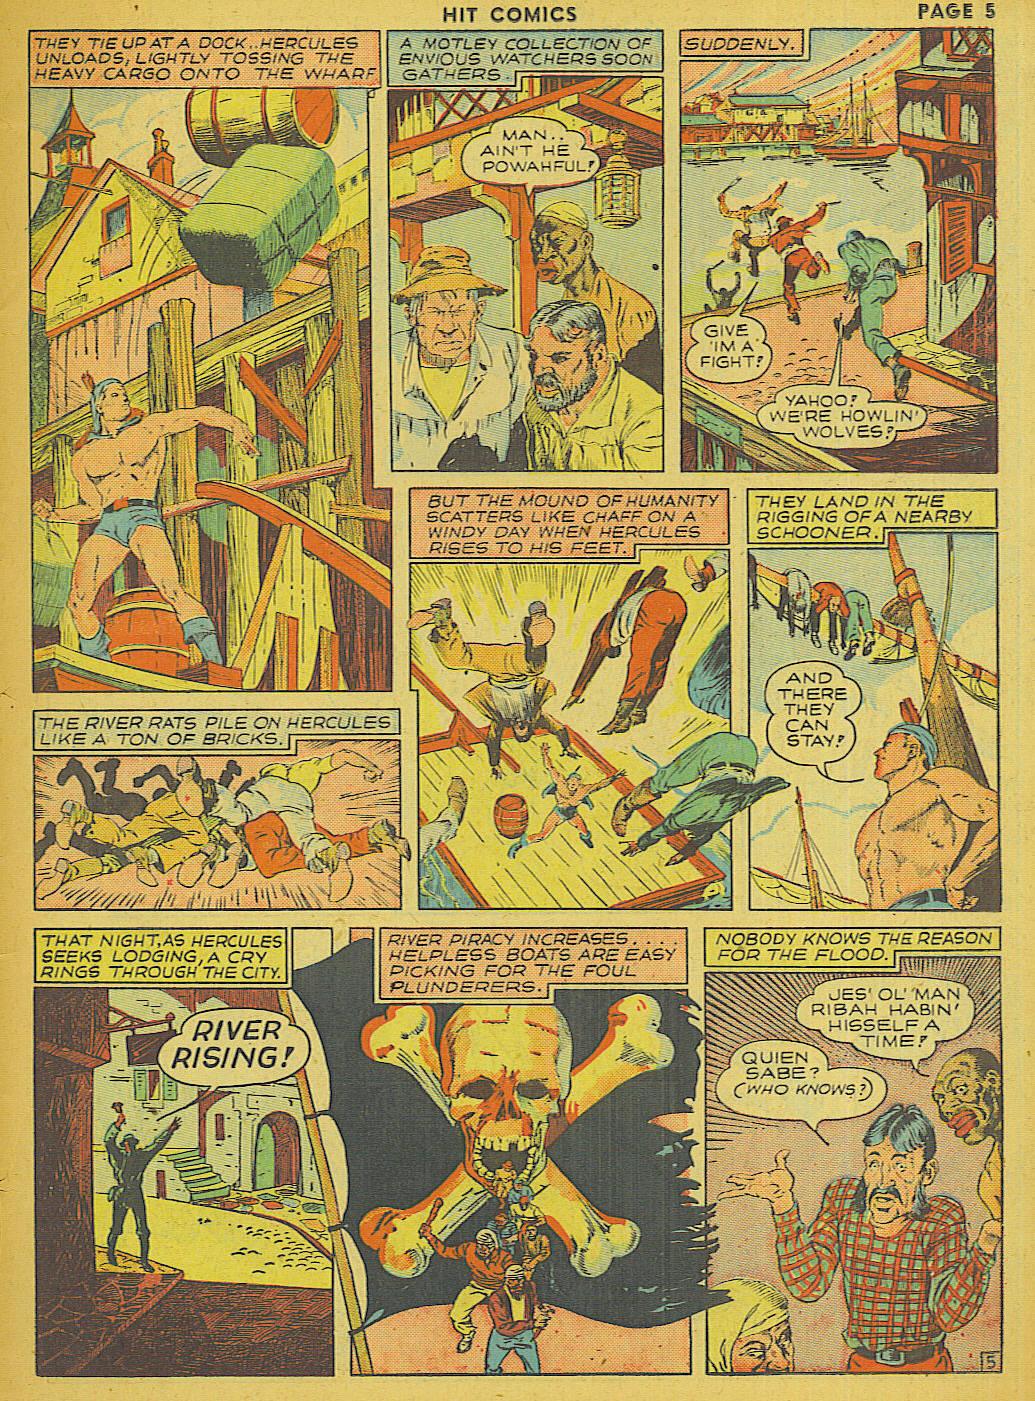 Read online Hit Comics comic -  Issue #13 - 7